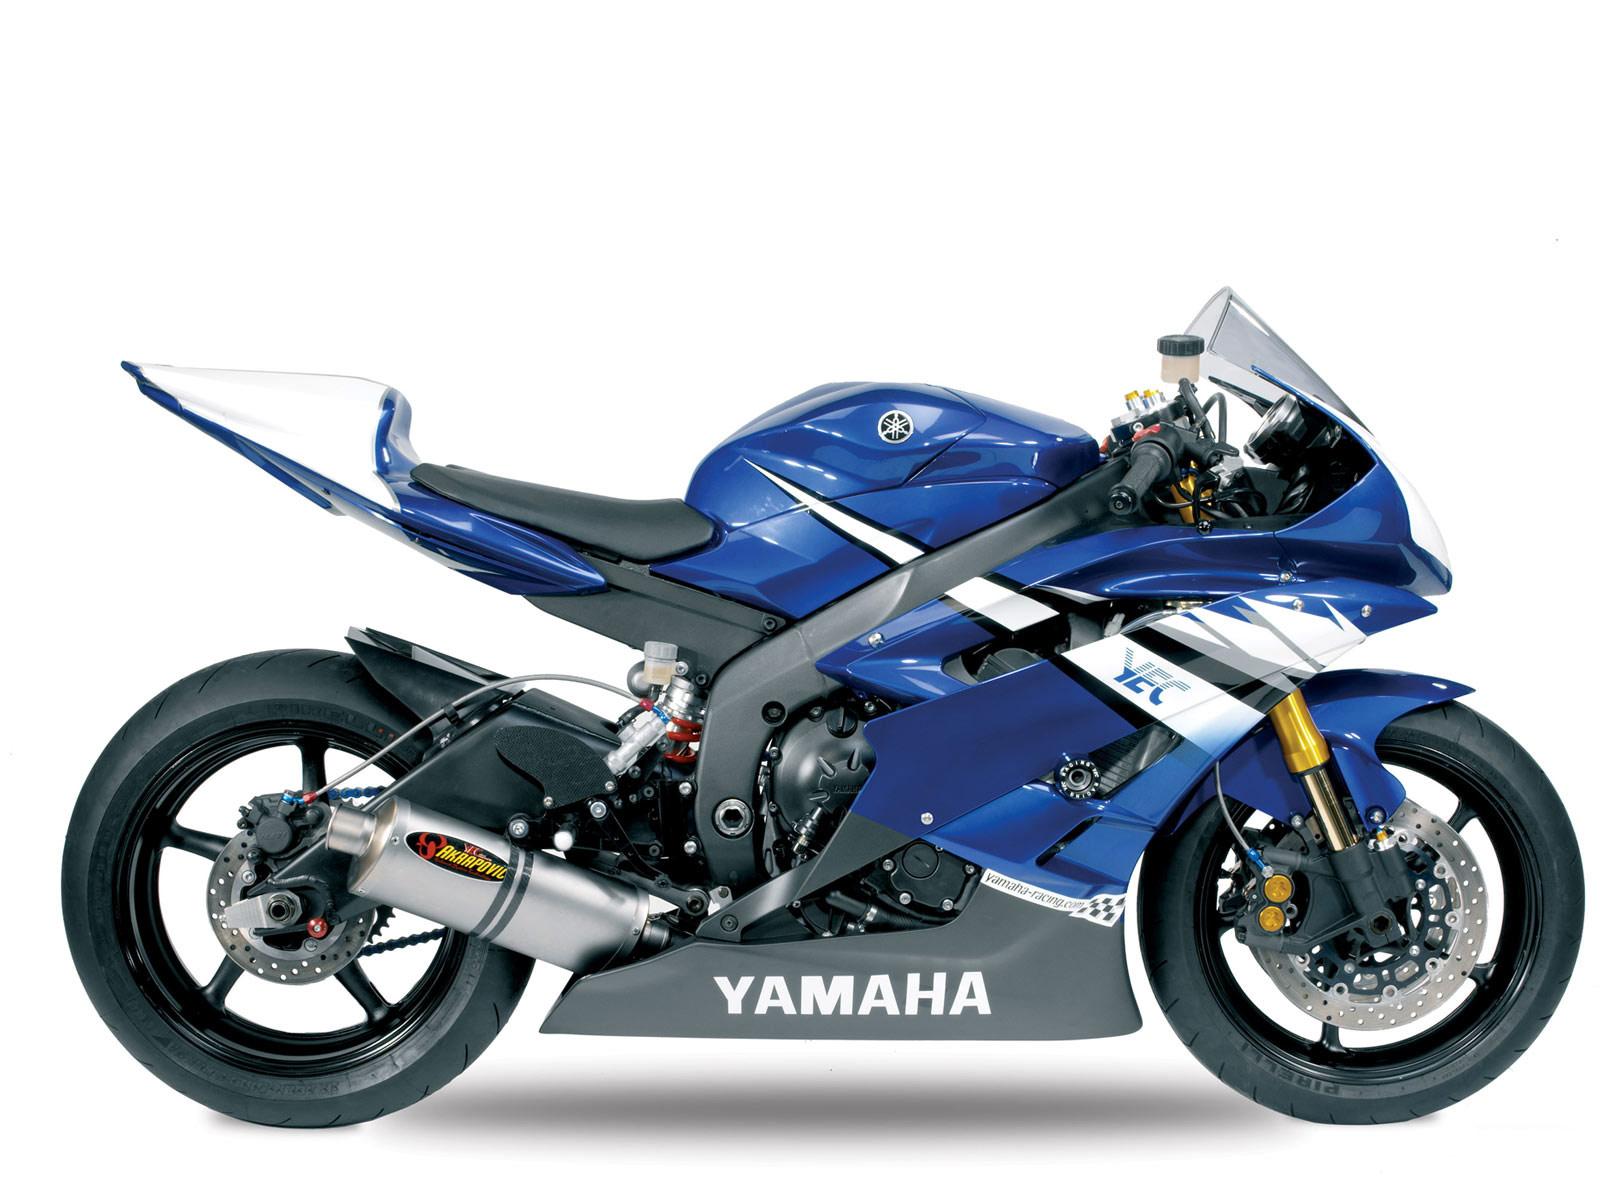 2012 yamaha yzf r6 reviews prices and specs review ebooks - Http 4 Bp Blogspot Com Qxzjrmzease Ts3j8dobiri 2006 Yamaha Yzf R6 Circuit Wallpaper